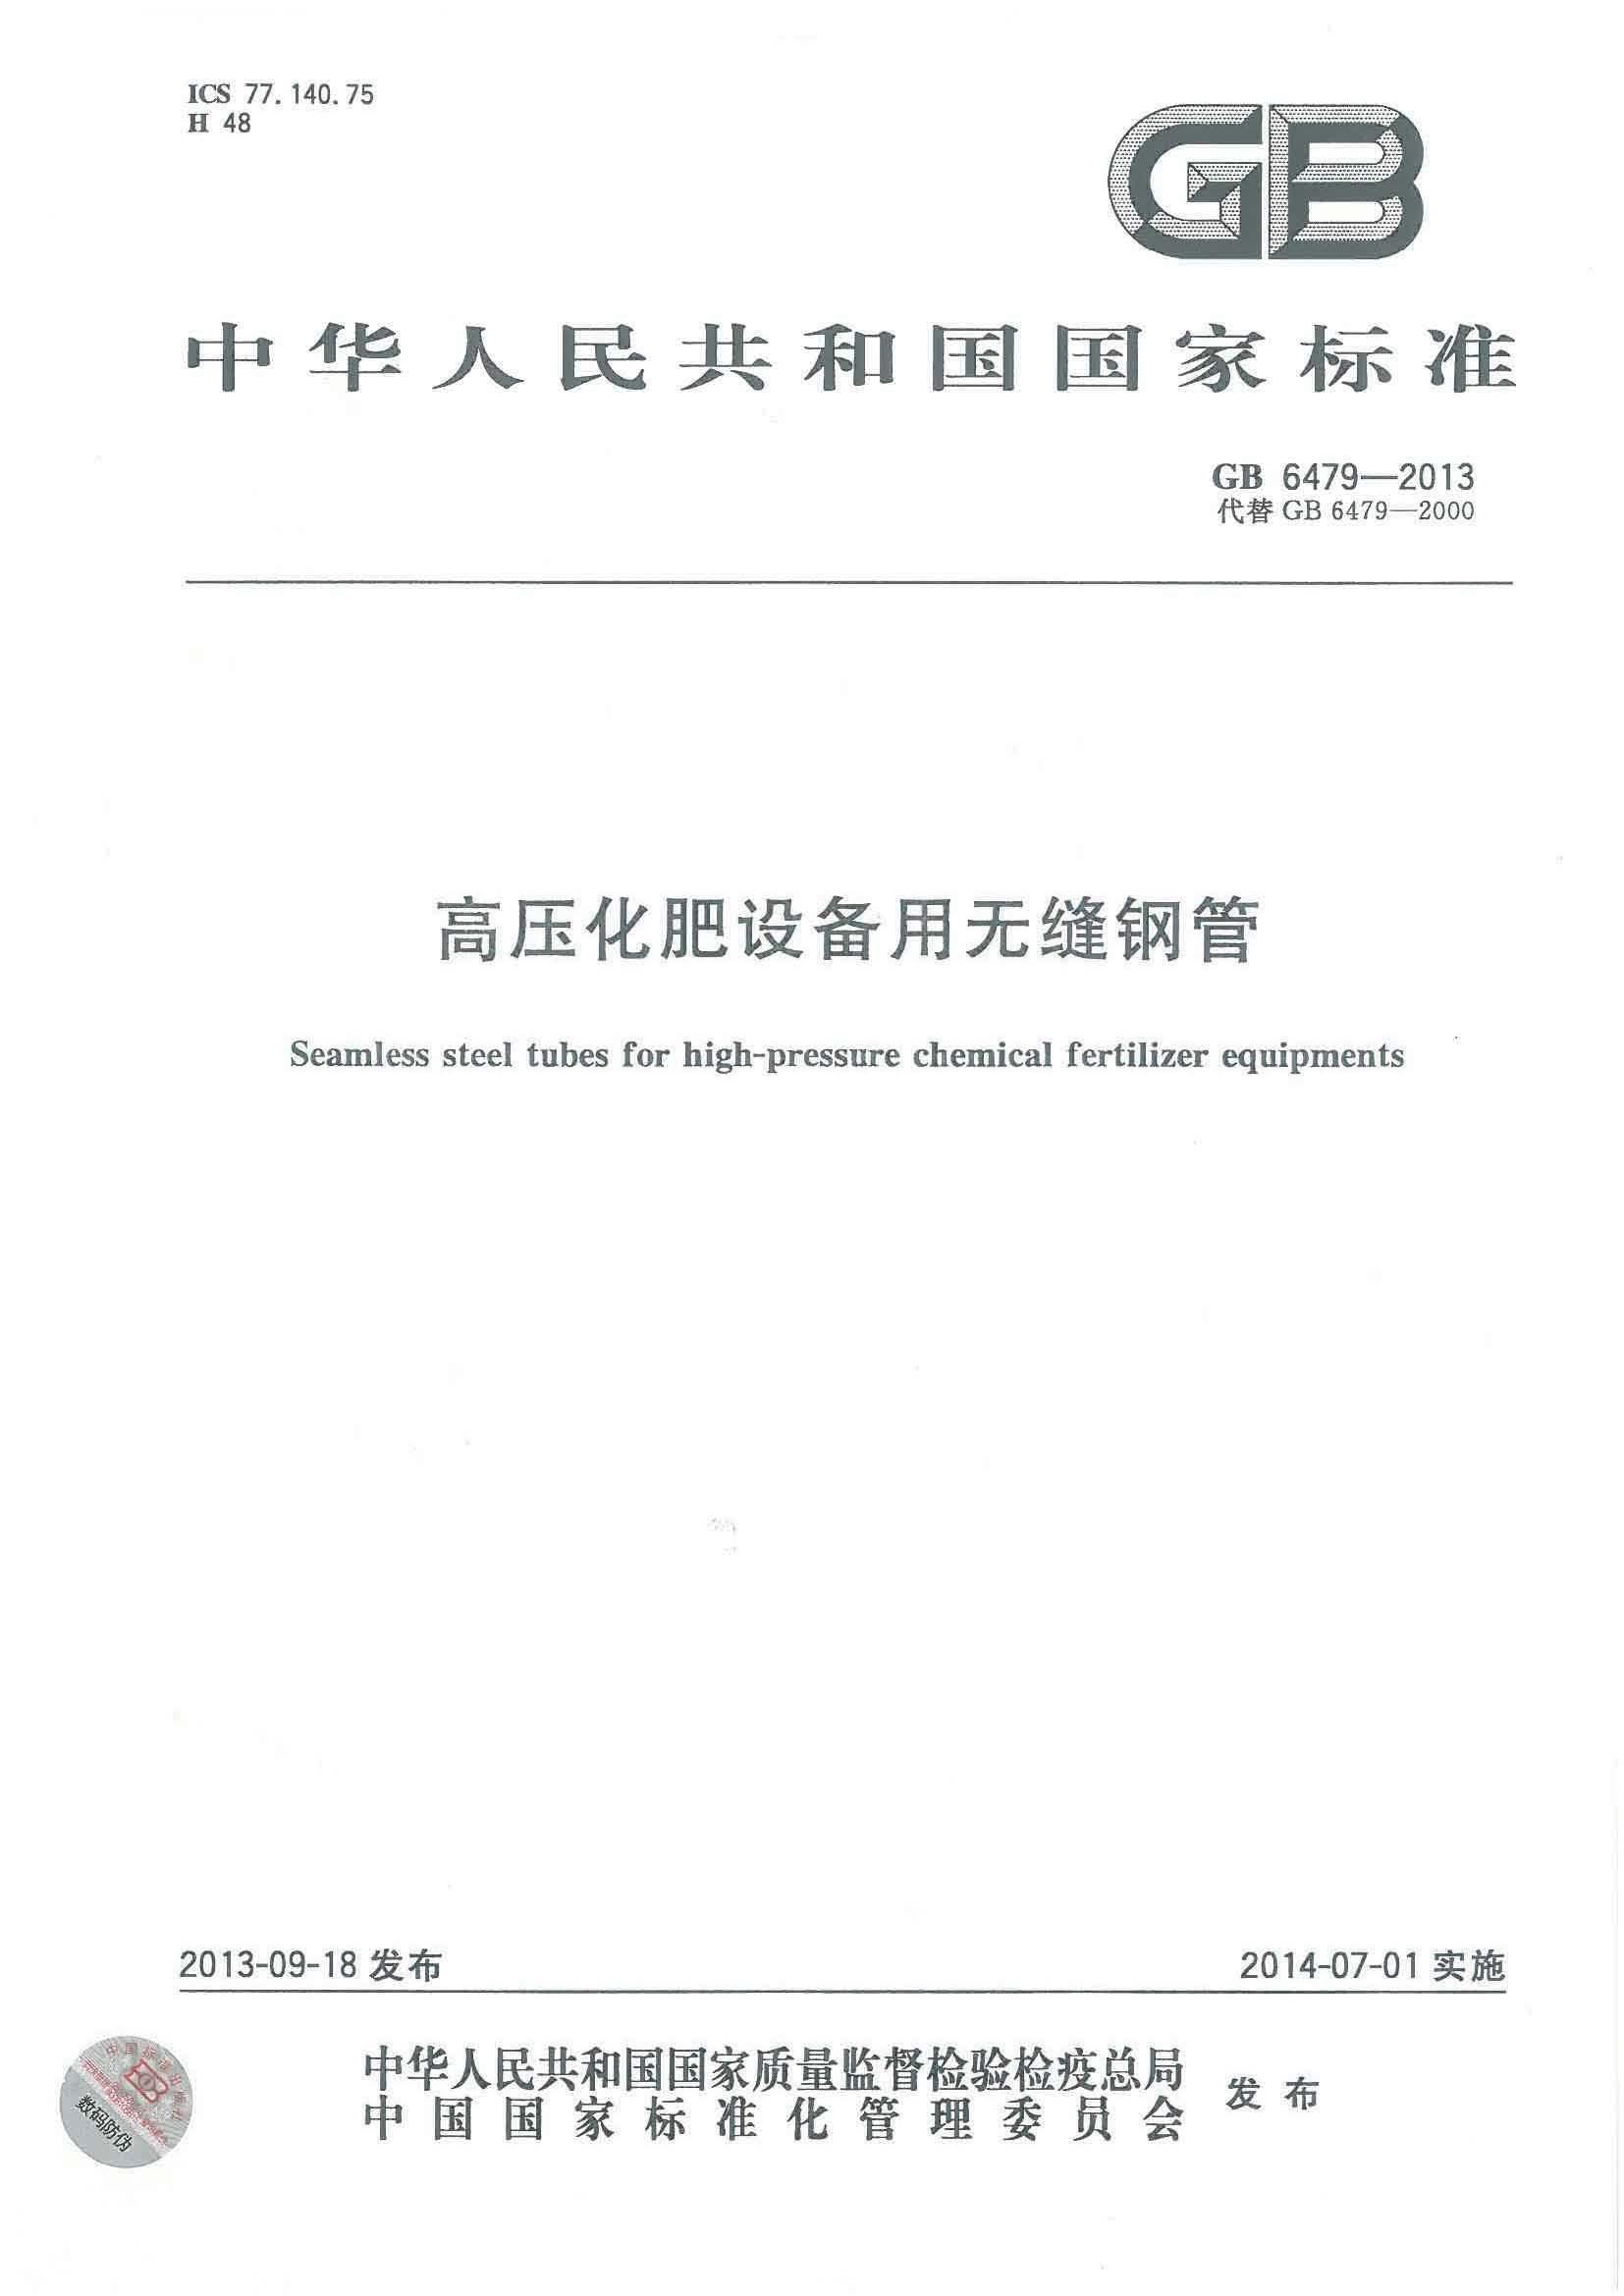 GB 6479-2013标准下载